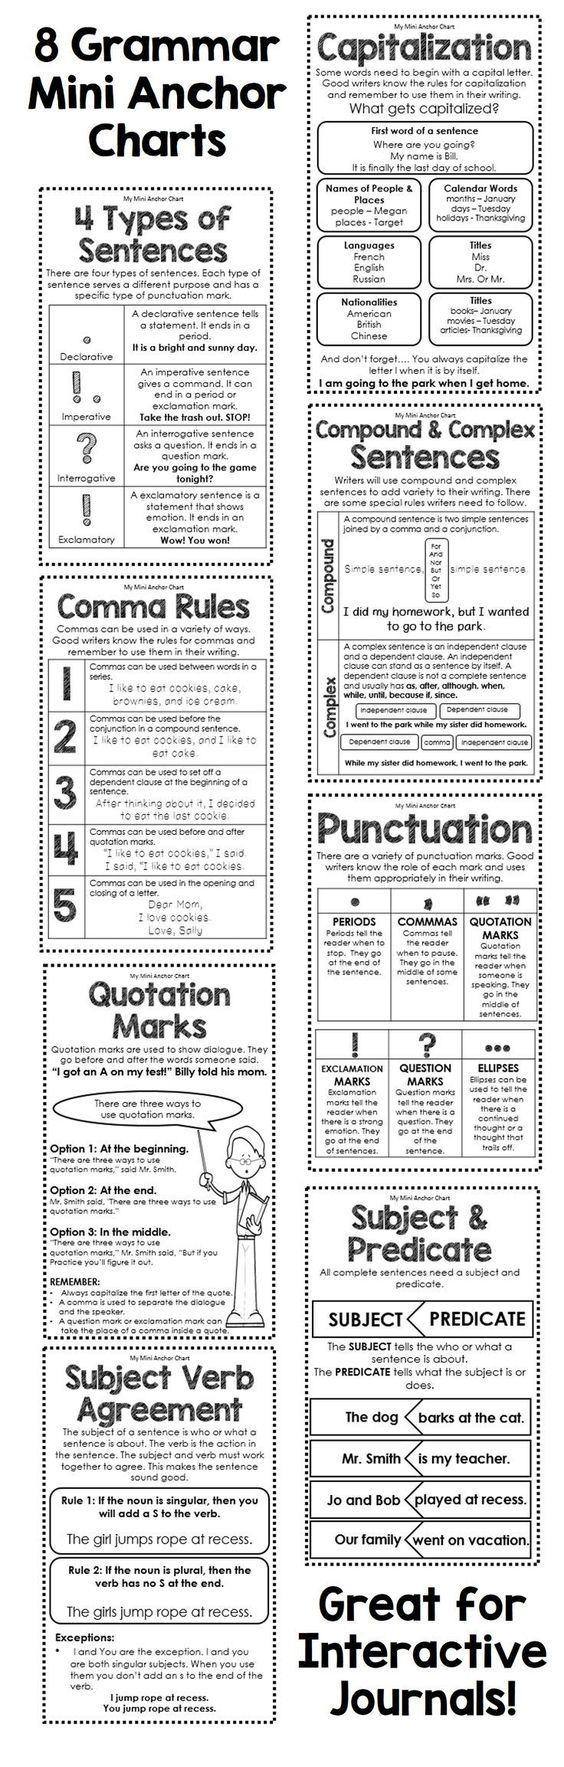 Best 25 grammar rules ideas on pinterest grammer rules grammar best 25 grammar rules ideas on pinterest grammer rules grammar and english grammar rules robcynllc Choice Image